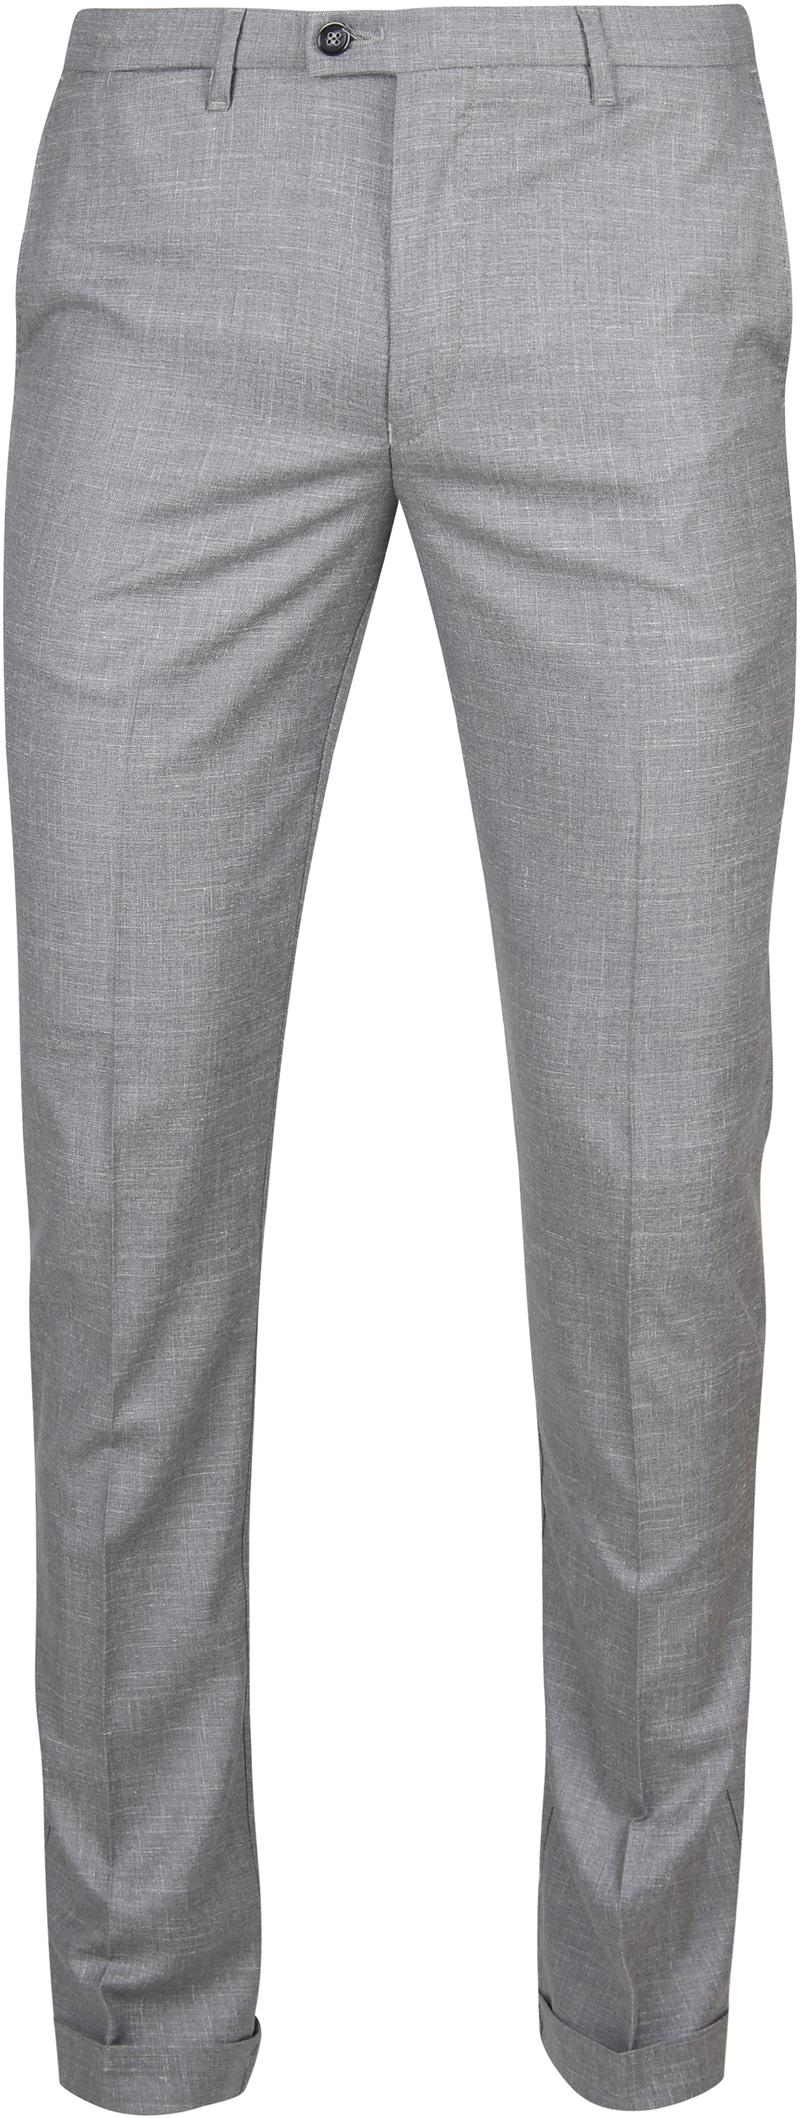 Suitable Pantalon Pisa Melange Grey photo 0